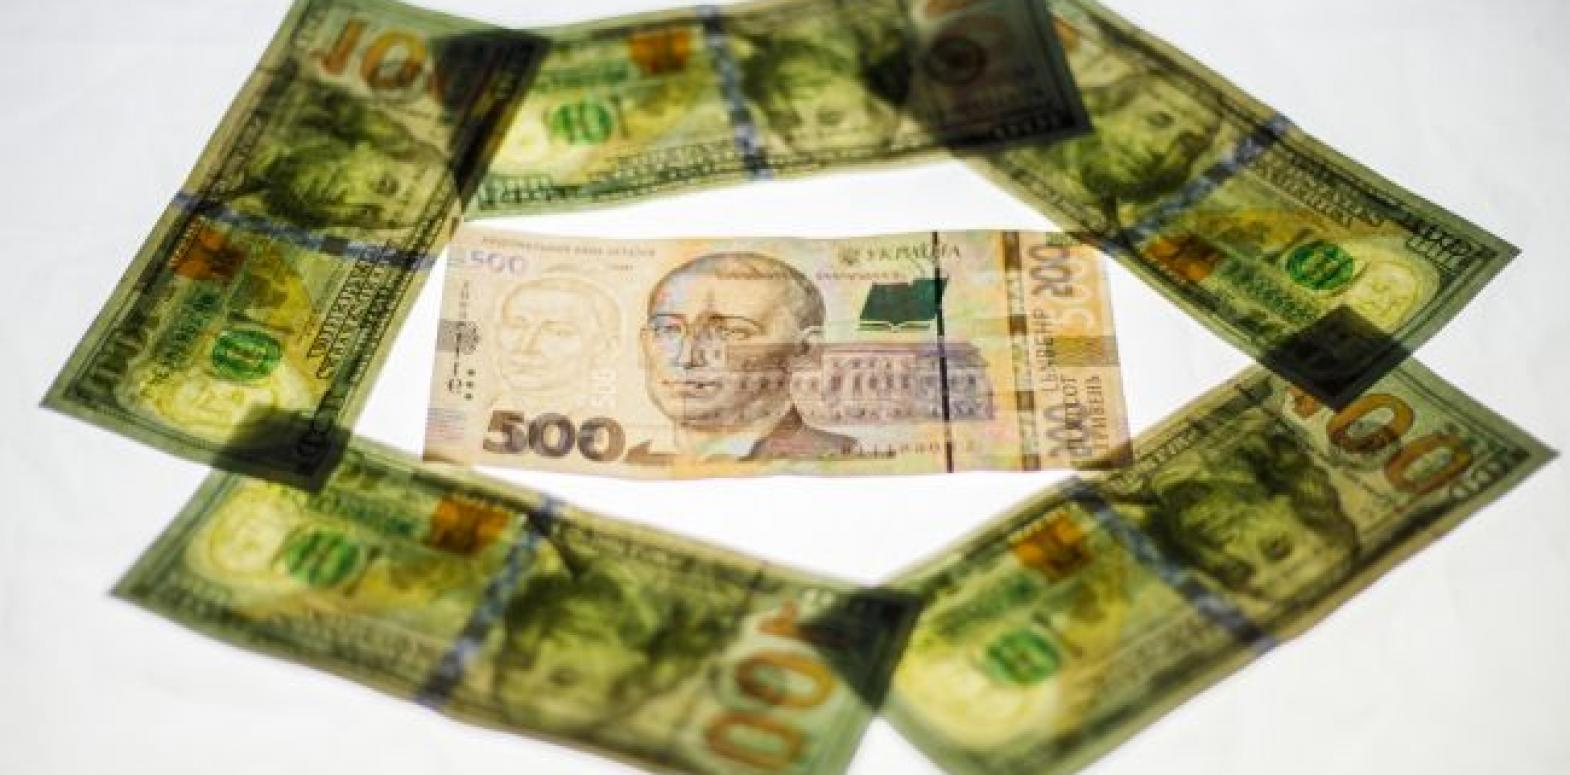 НБУ на 27 марта поднял курс доллара до максимума с начала года